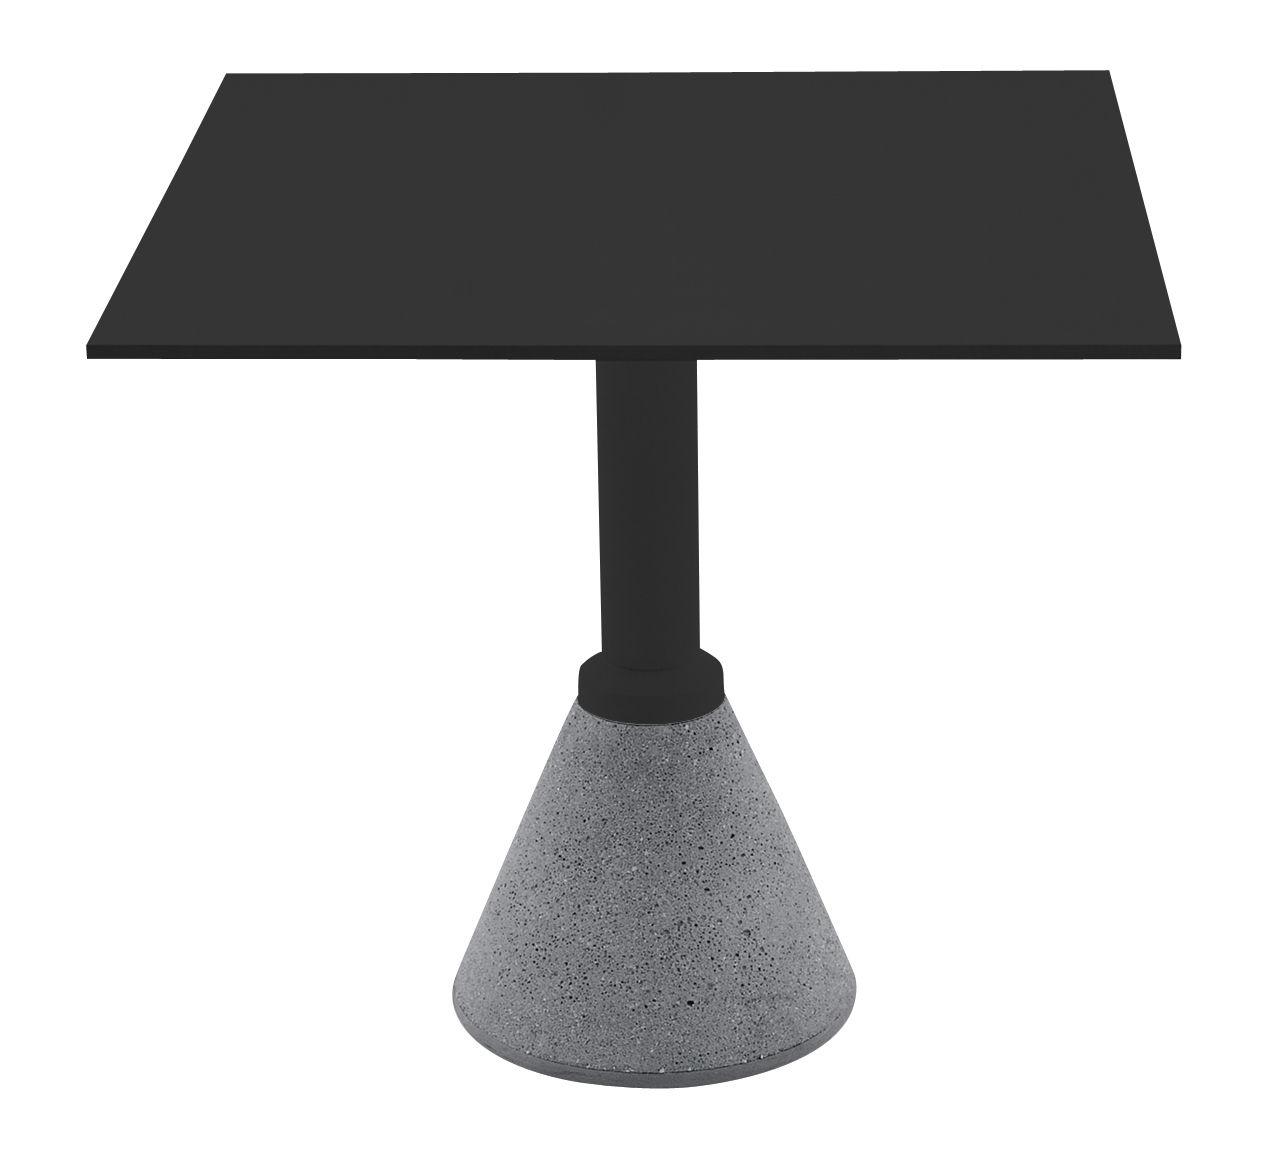 Outdoor - Tische - One Bistrot quadratischer Tisch 79 x 79 cm - Magis - 79 x 79 cm - schwarz - Aluminium, Beton, HPL